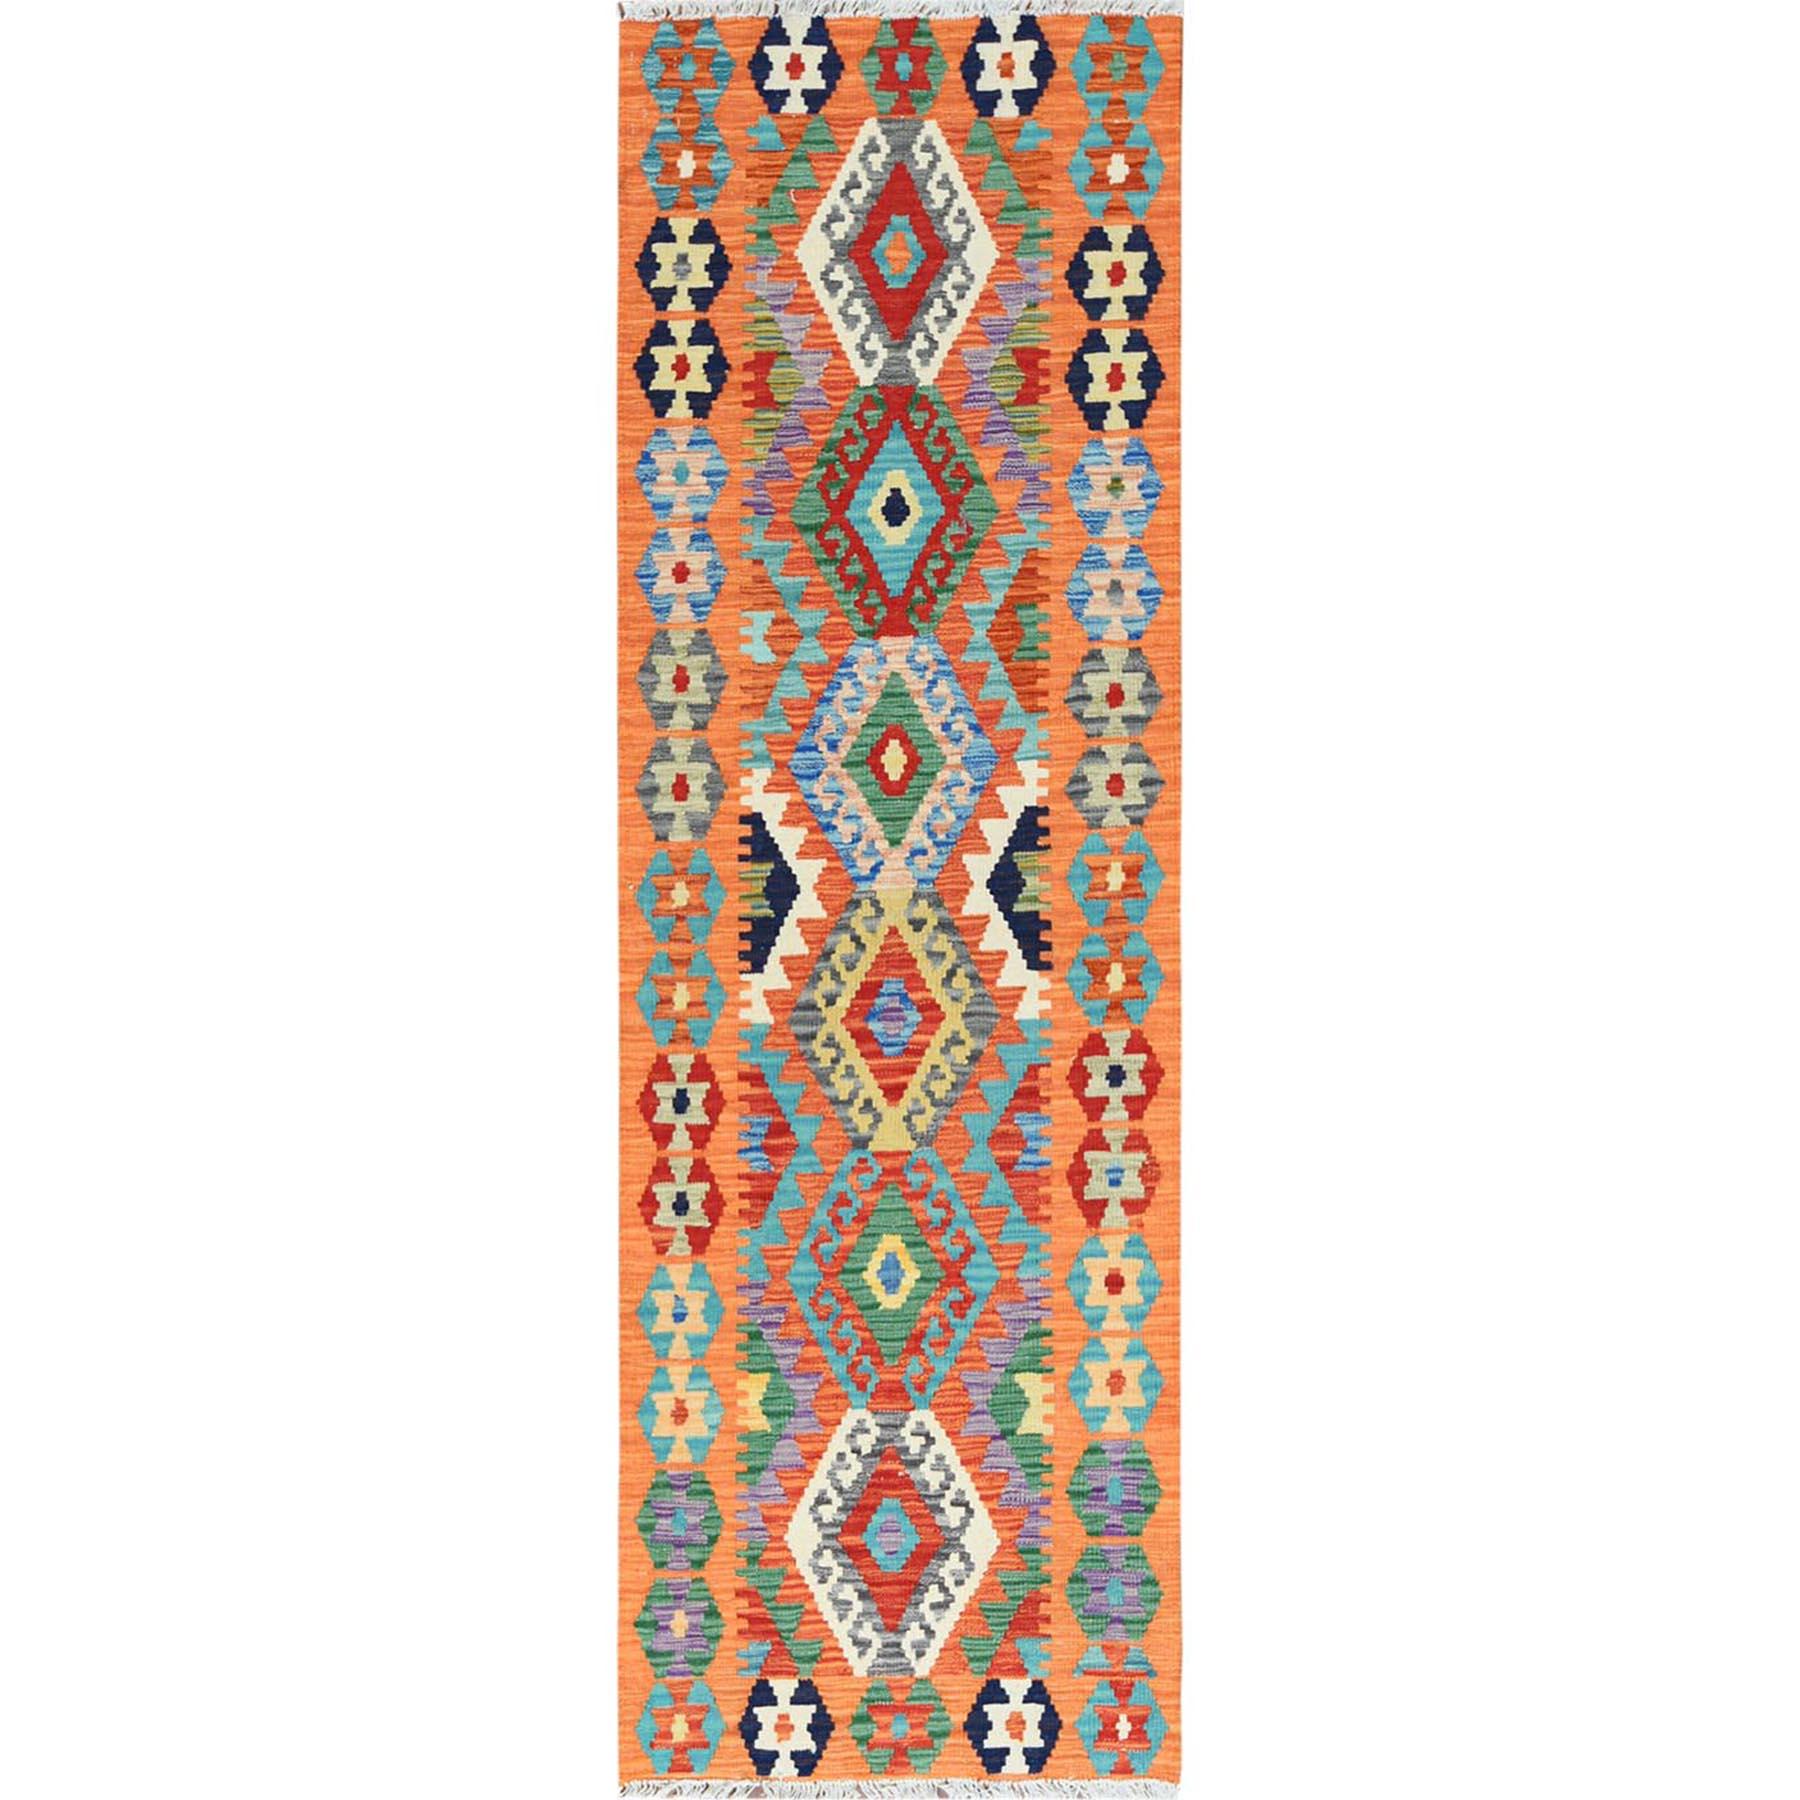 "2'4""x6'6"" Geometric Design Orange Afghan Kilim Reversible Herbal Wash Natural Wool Hand Woven Ethnic Oriental Runner Rug"